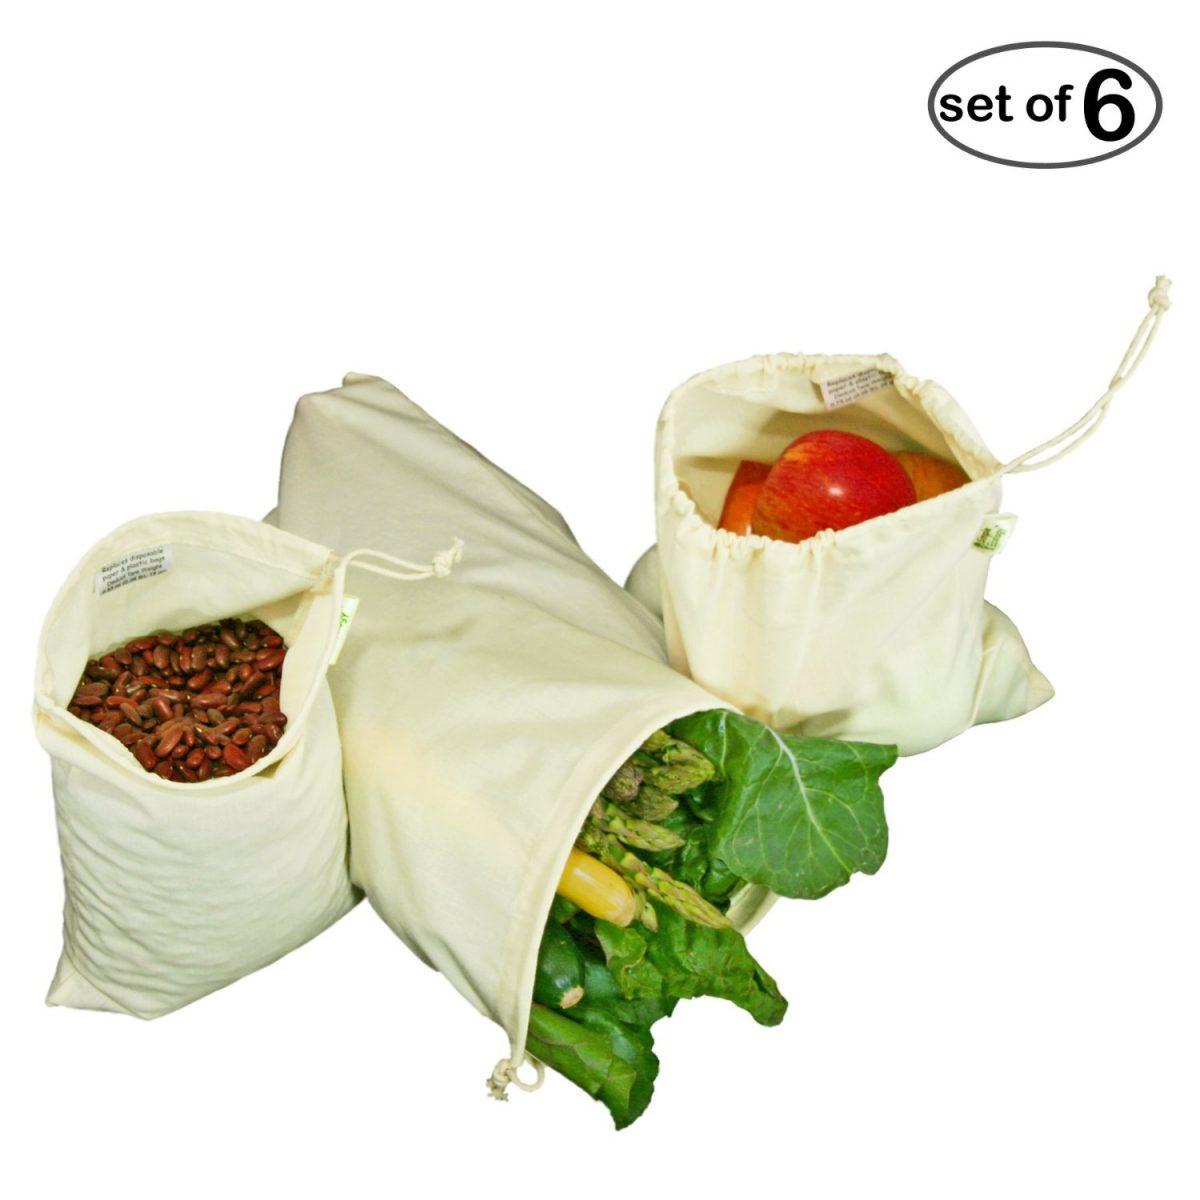 Cotton Produce Bags